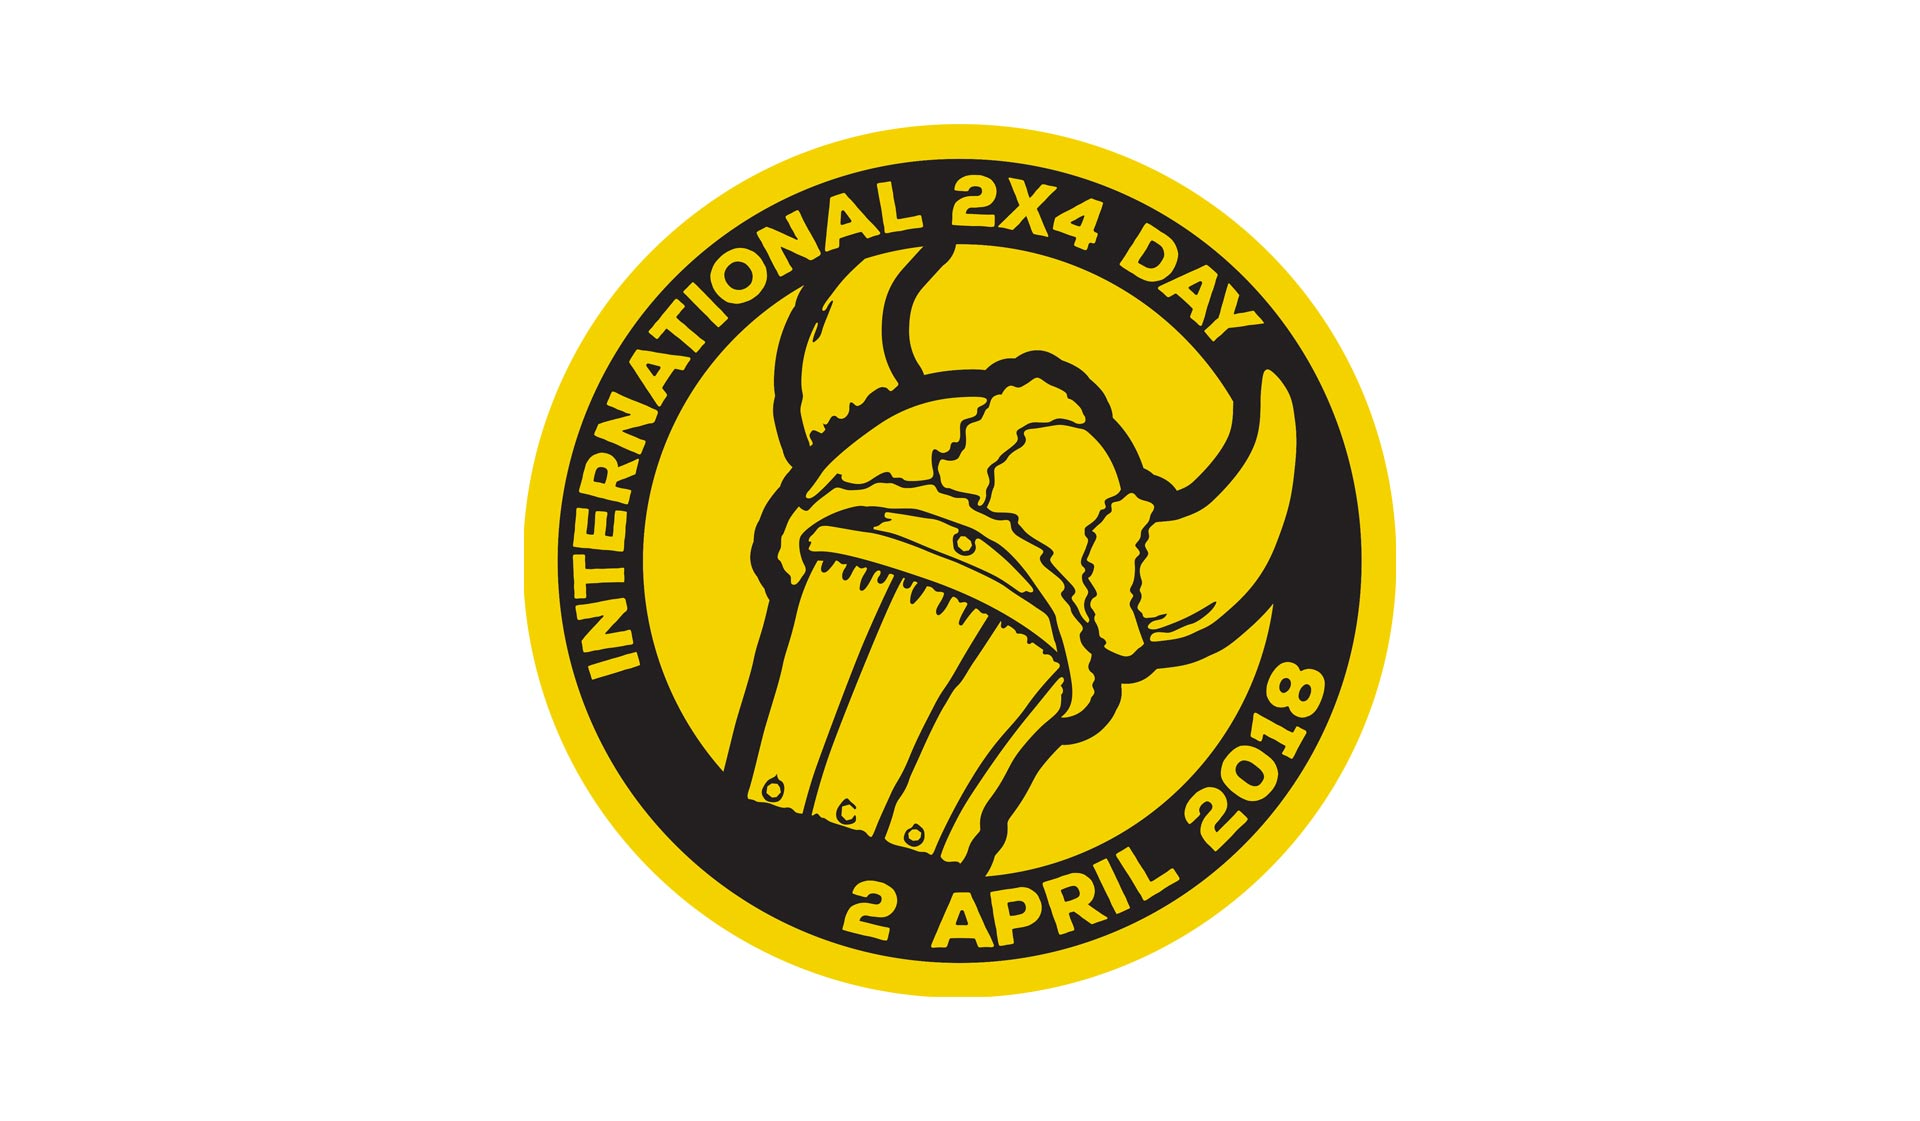 International 2x4 Day